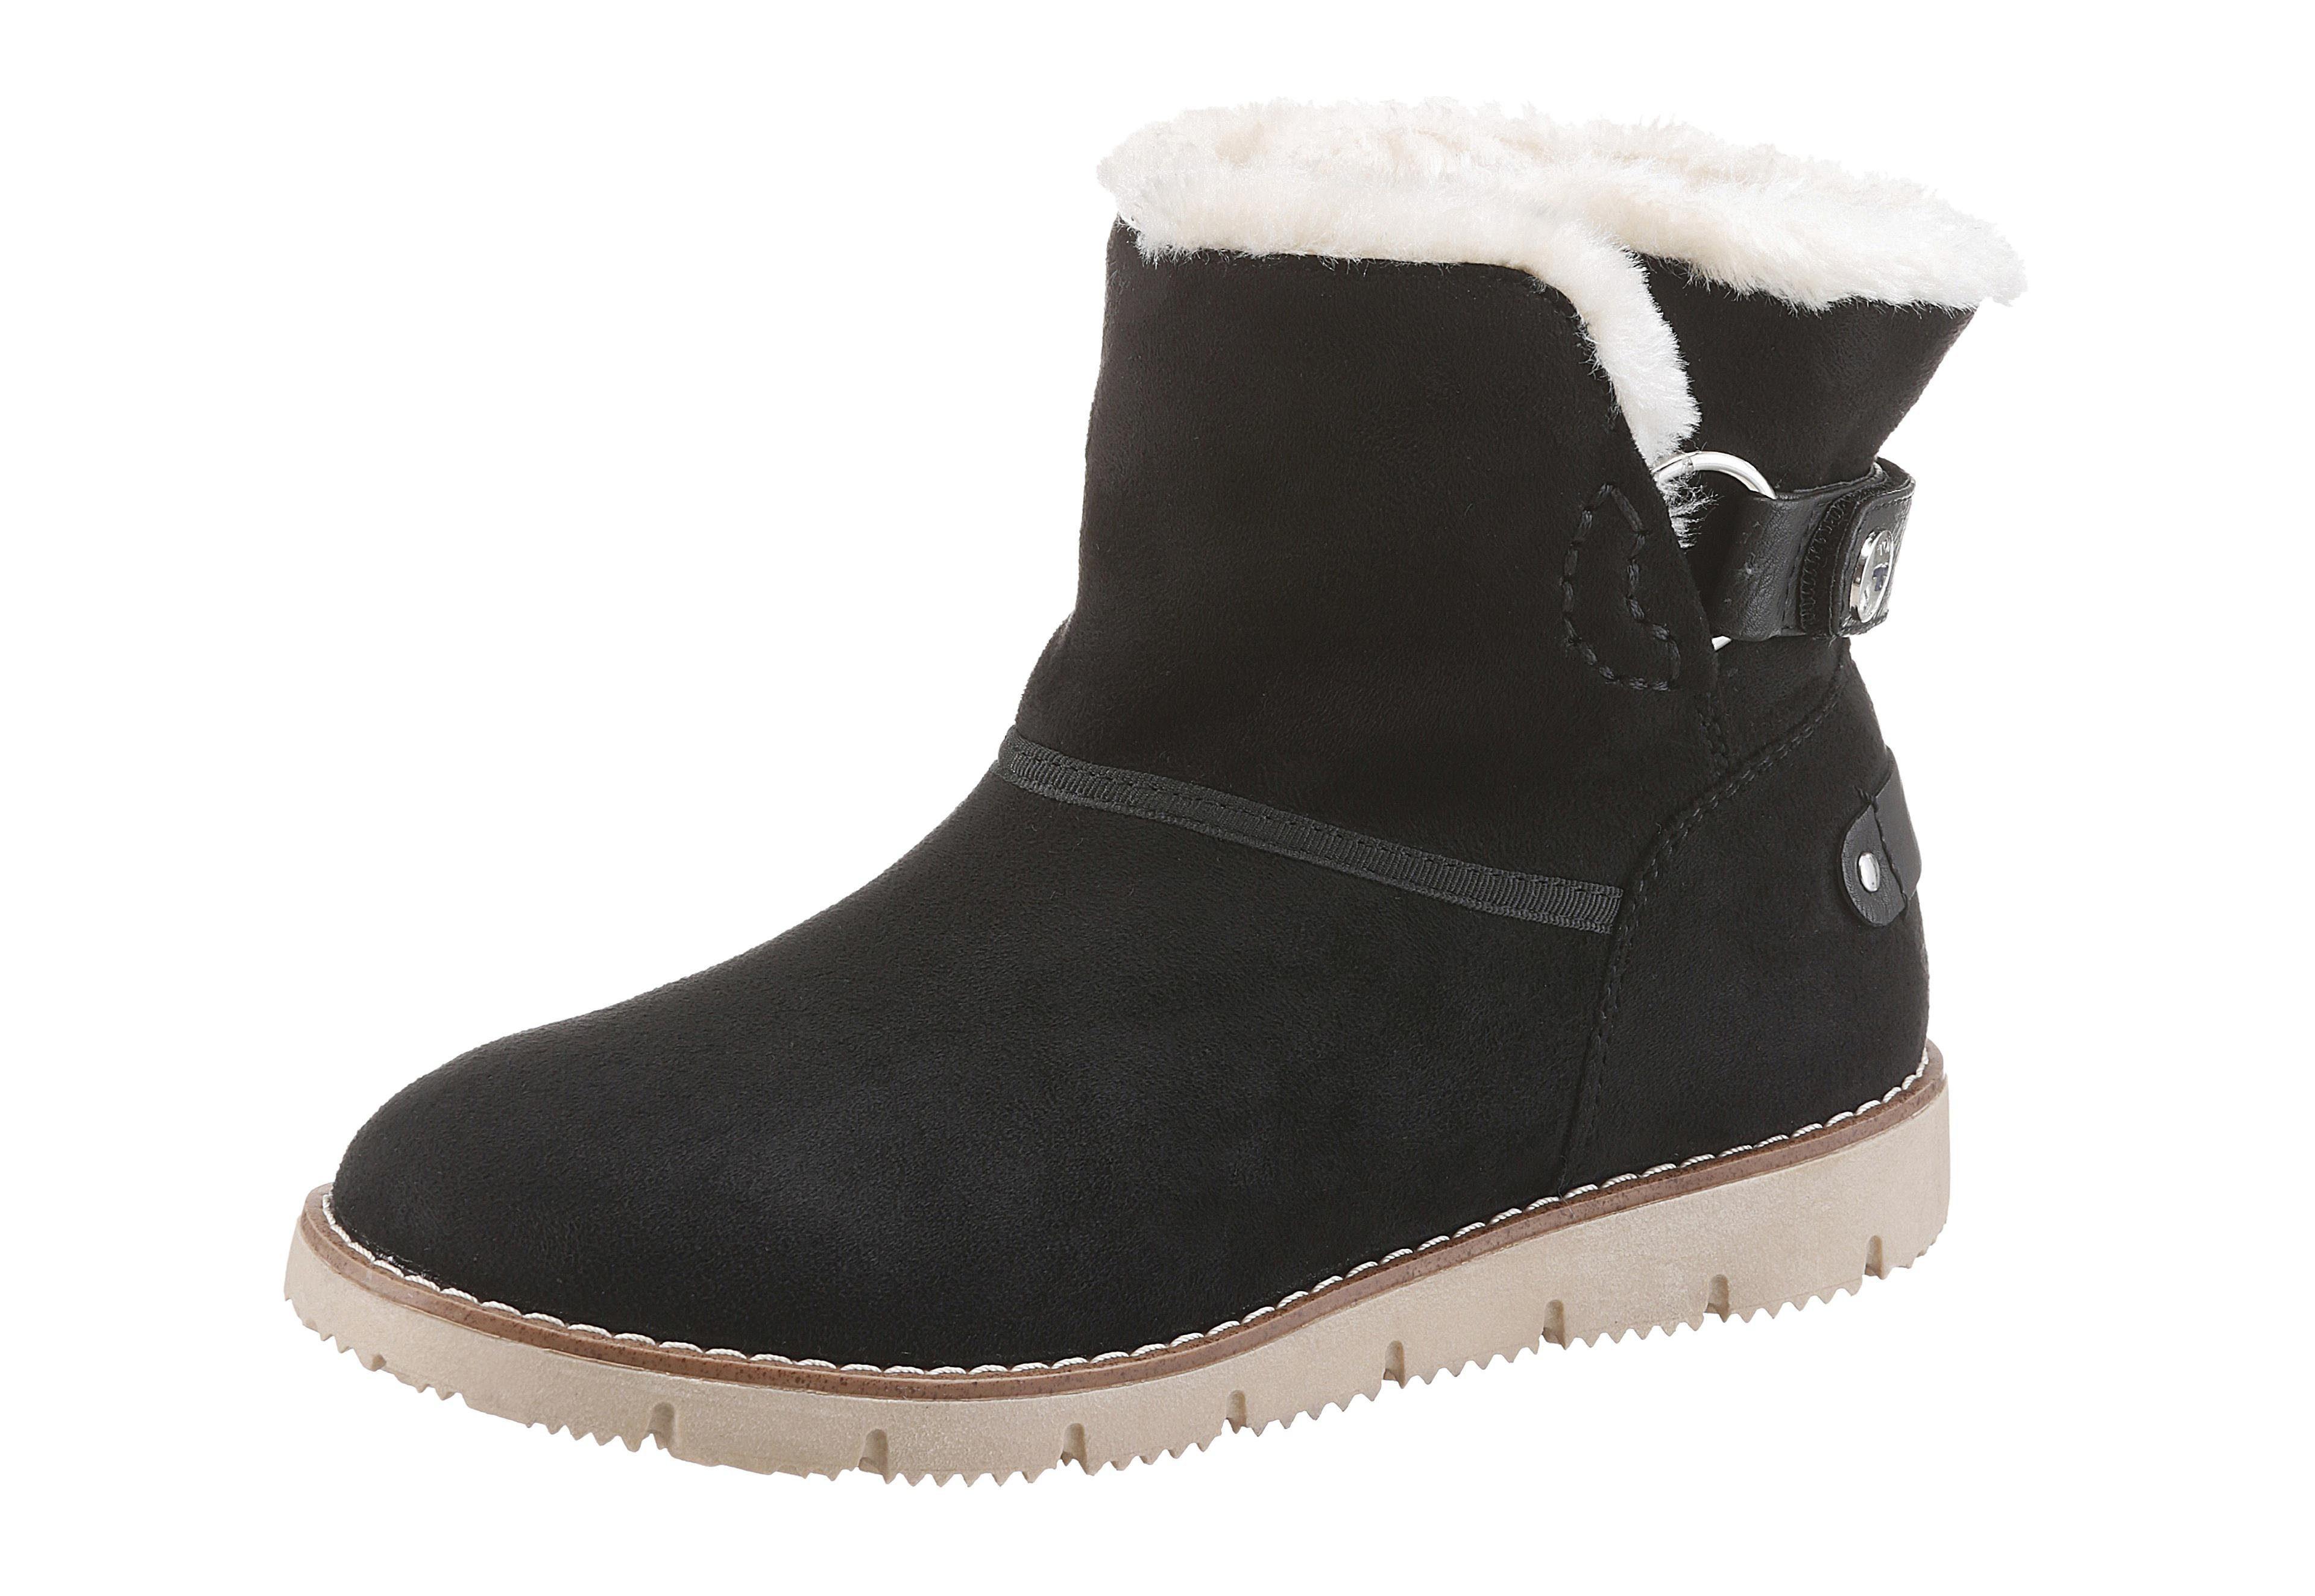 TOM TAILOR Winterboots | Schuhe > Boots > Winterboots | Schwarz | Tom Tailor